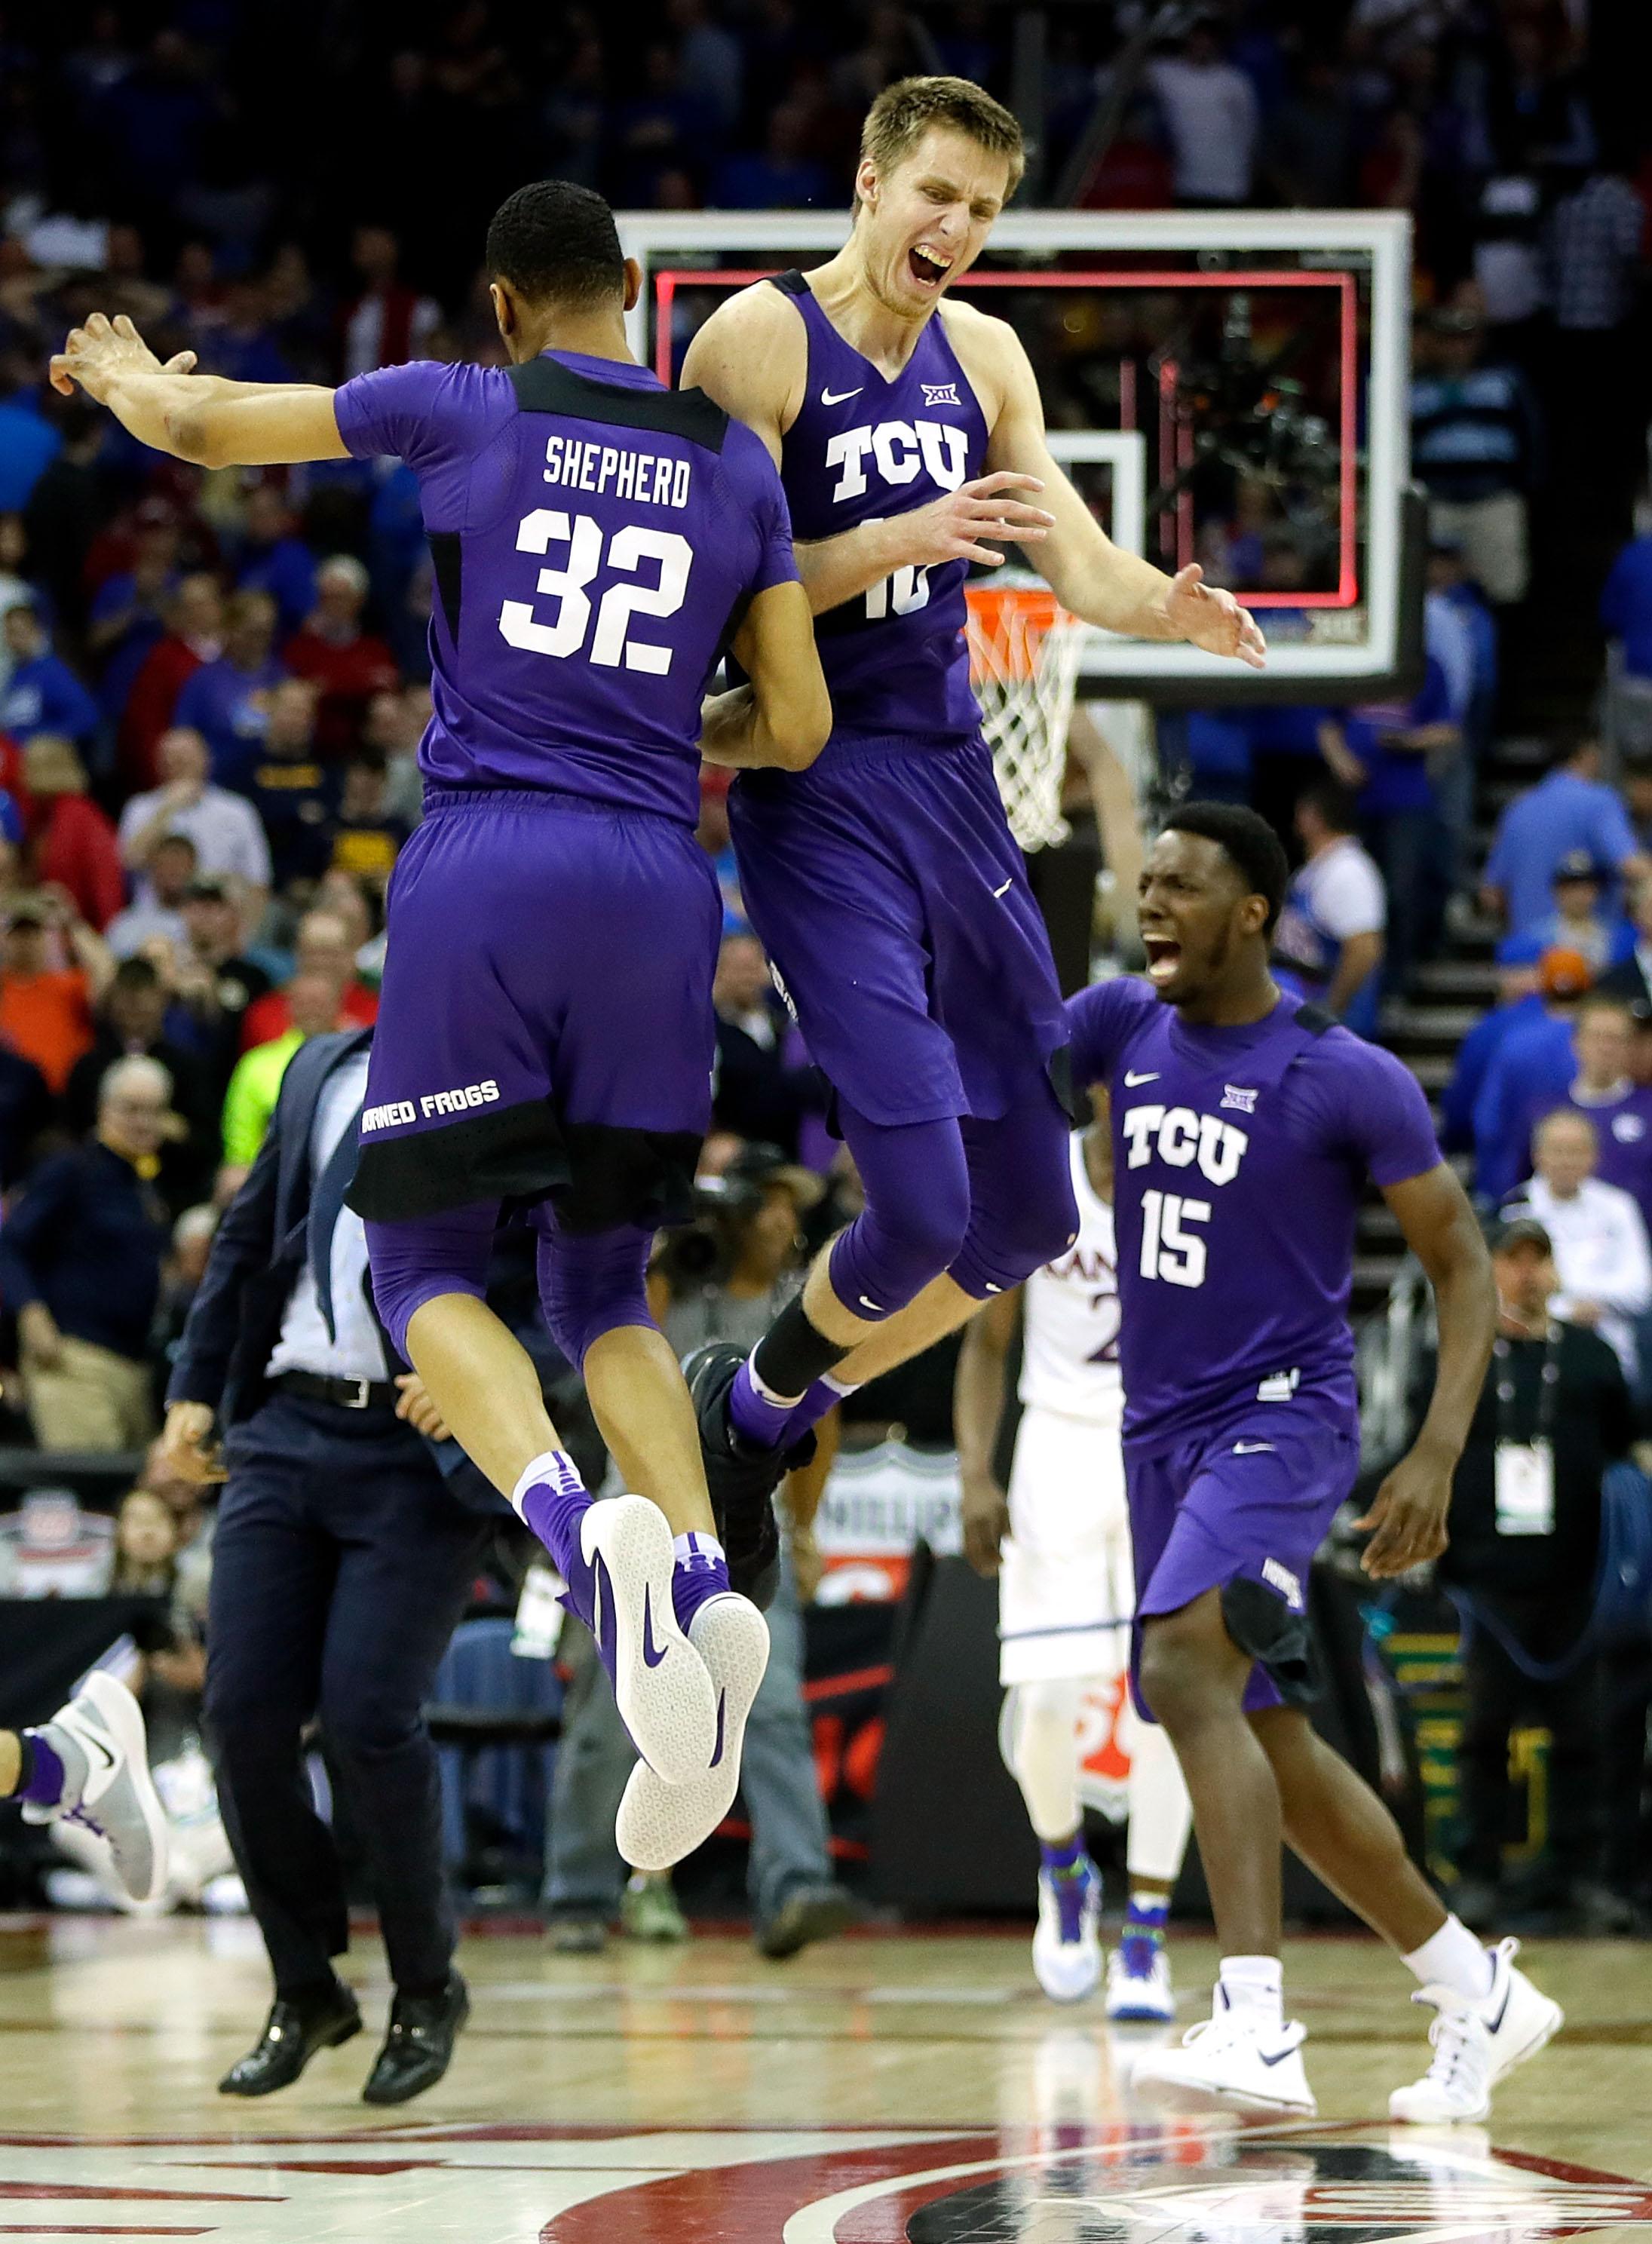 650521538 big 12 basketball tournament quartefinals.jpg - March Madness 2018: The Tournament's Most Dangerous Bubble Teams